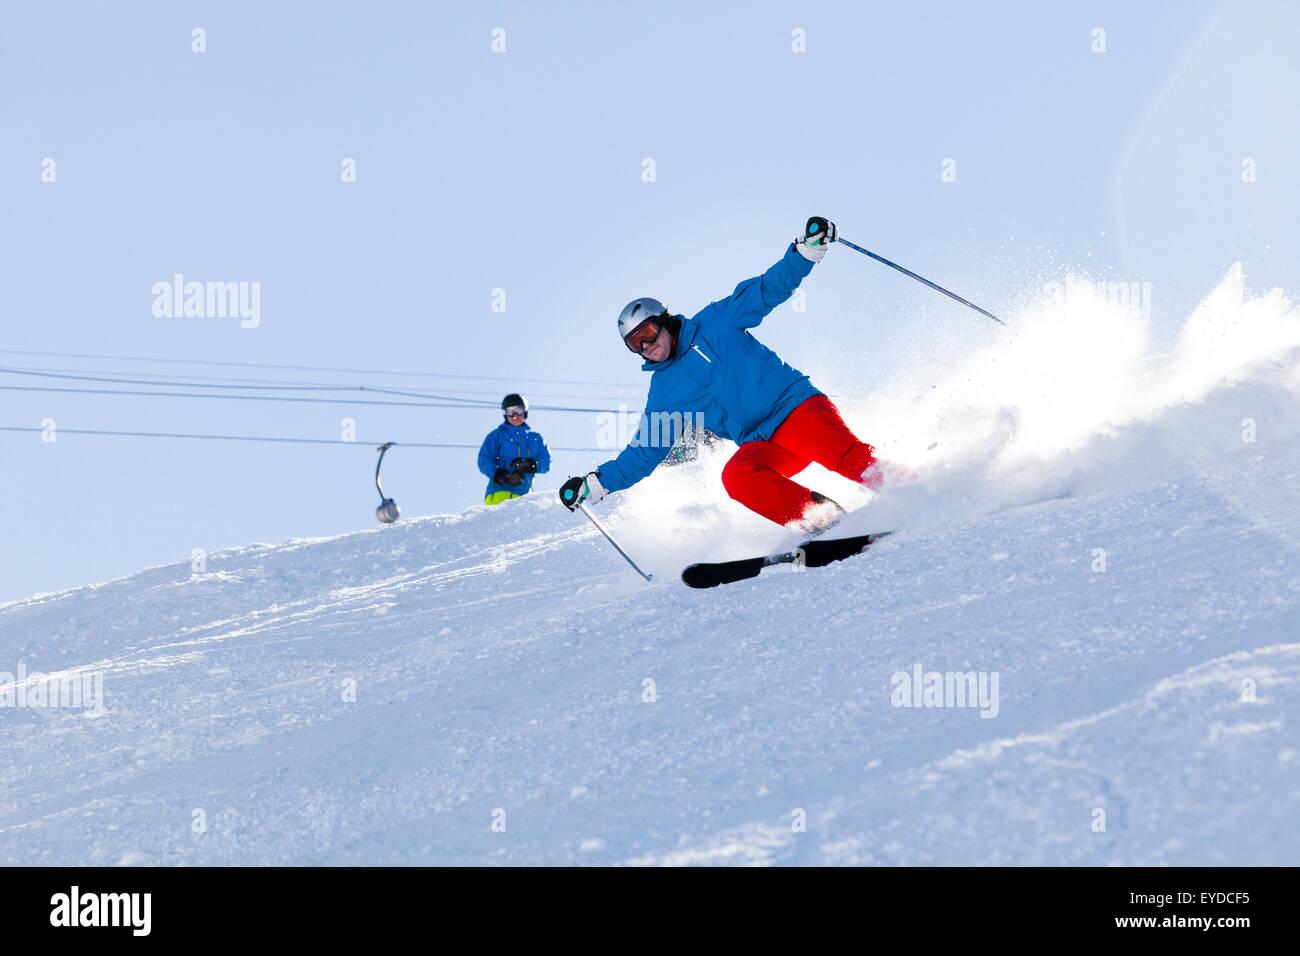 Ski holiday, Skier carving downhill, Sudelfeld, Bavaria, Germany Stock Photo